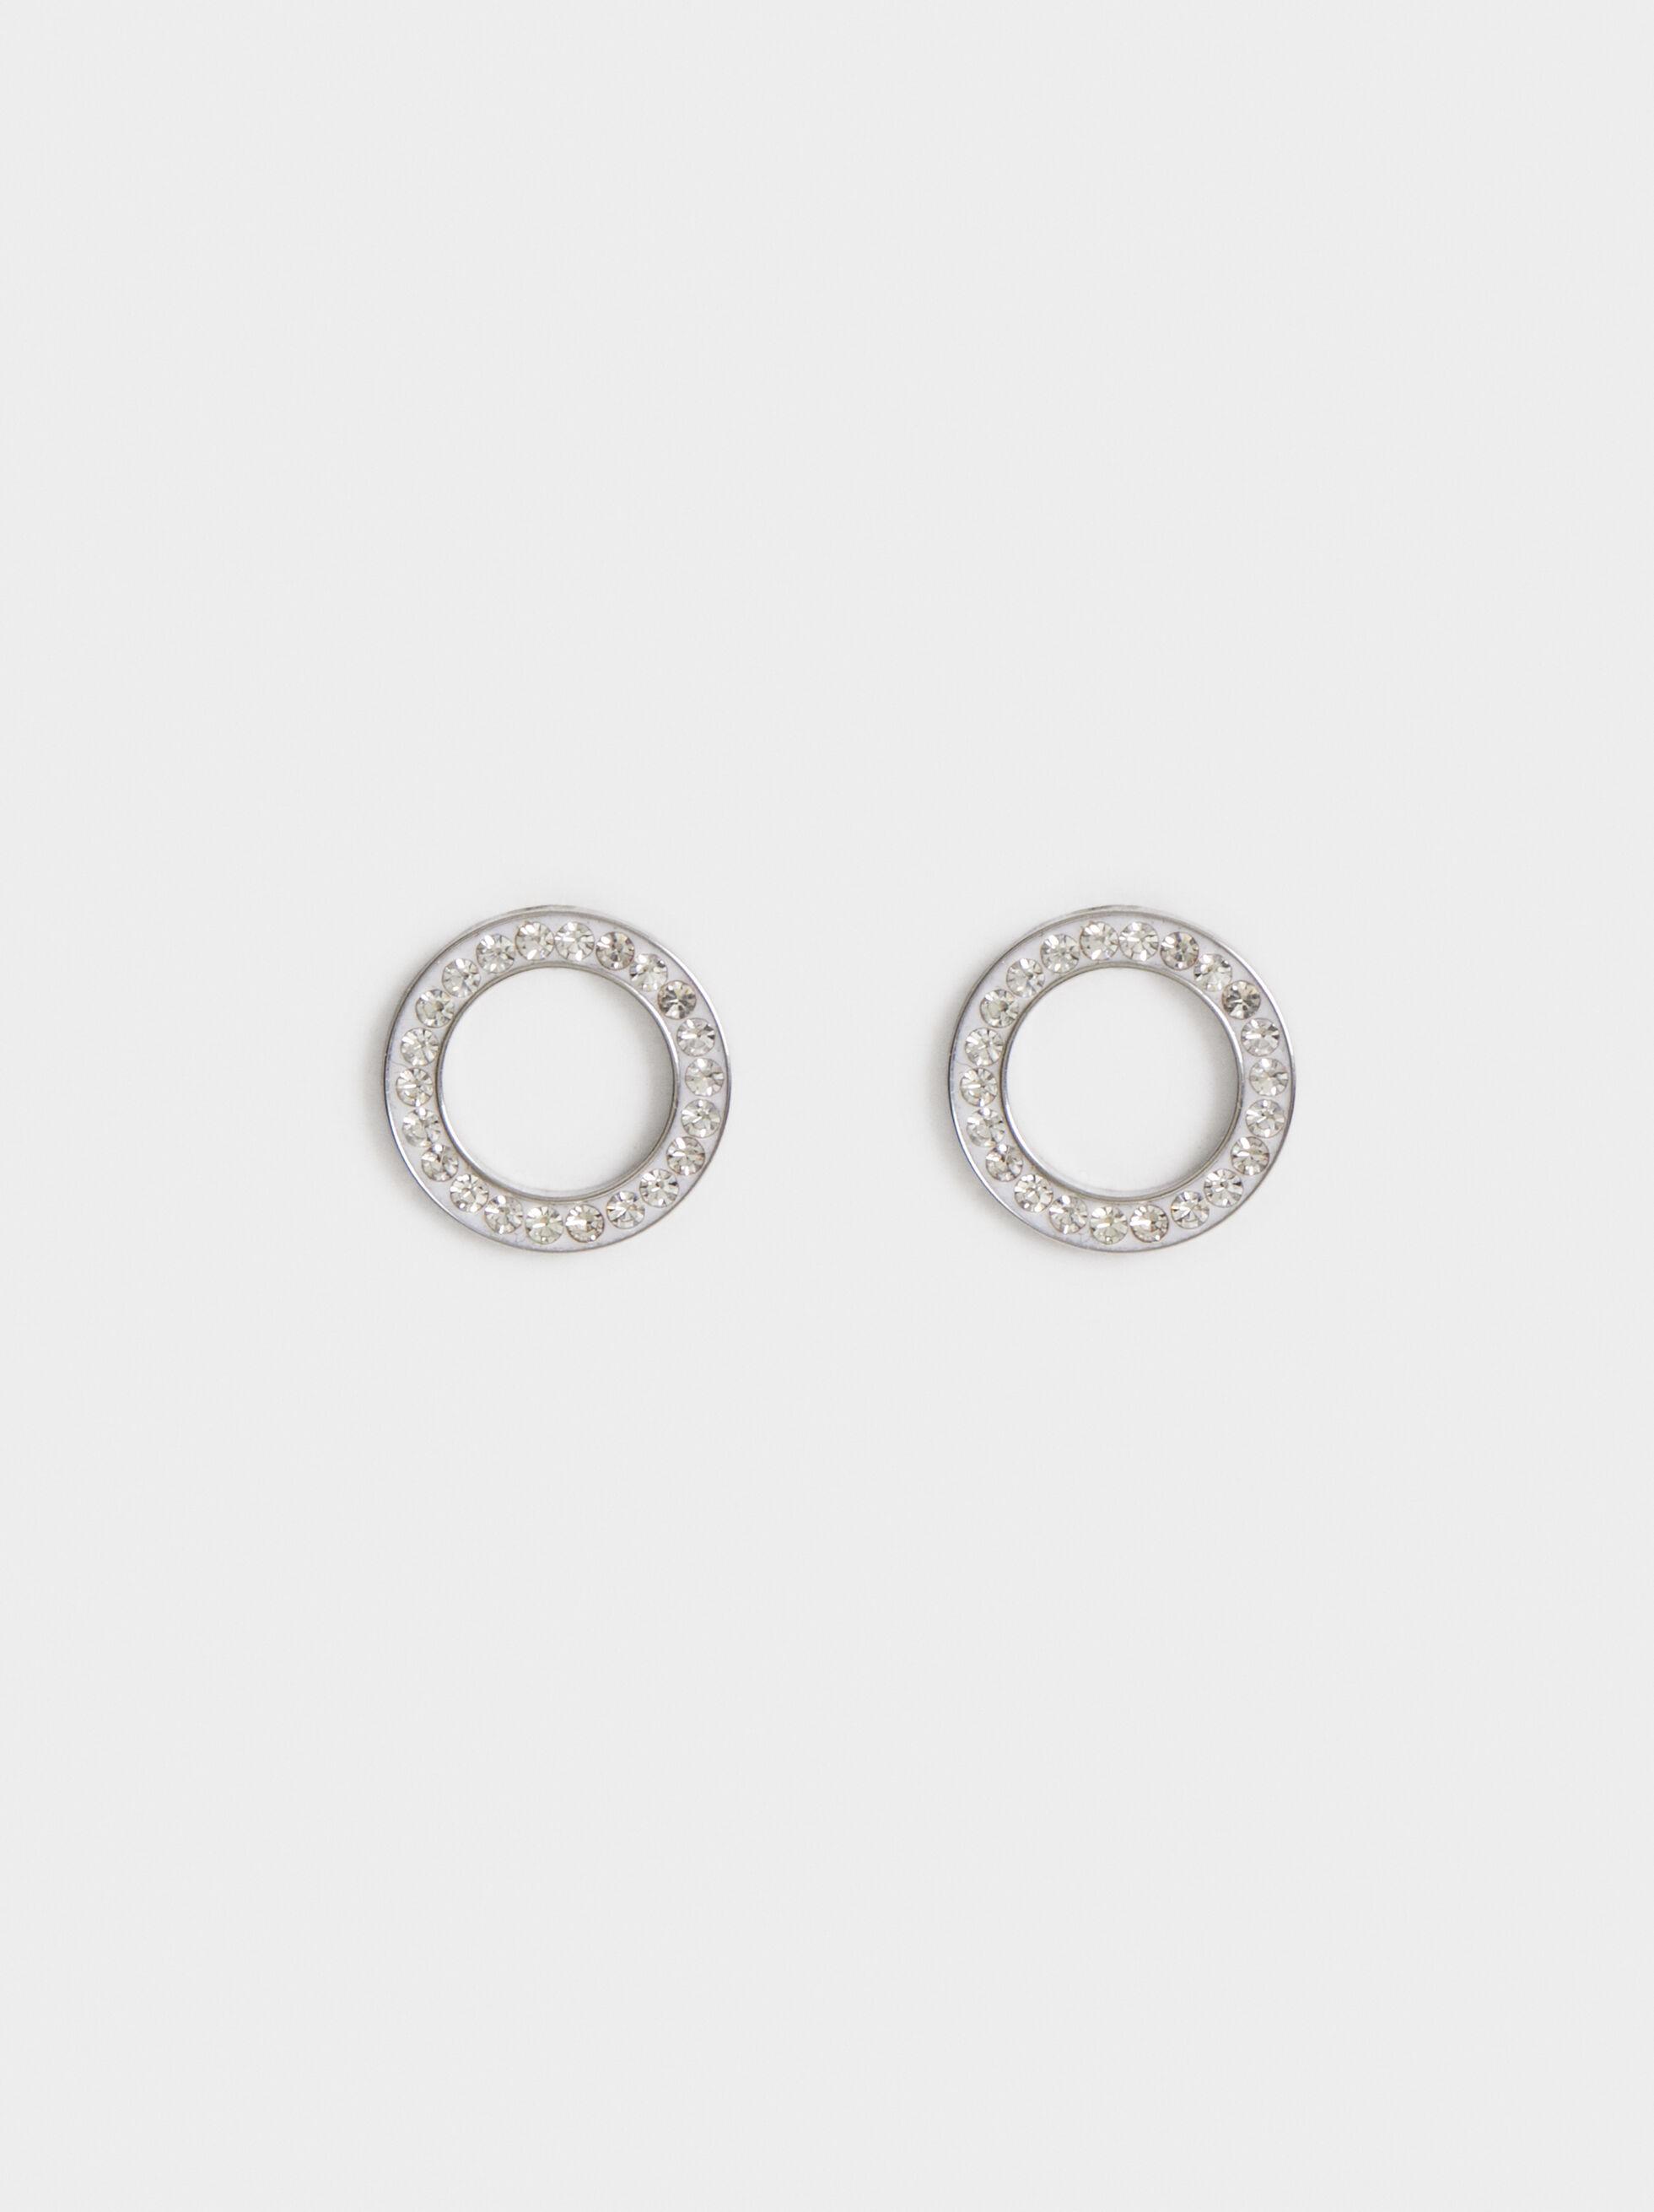 Steel Rhinestone Studs, Silver, hi-res